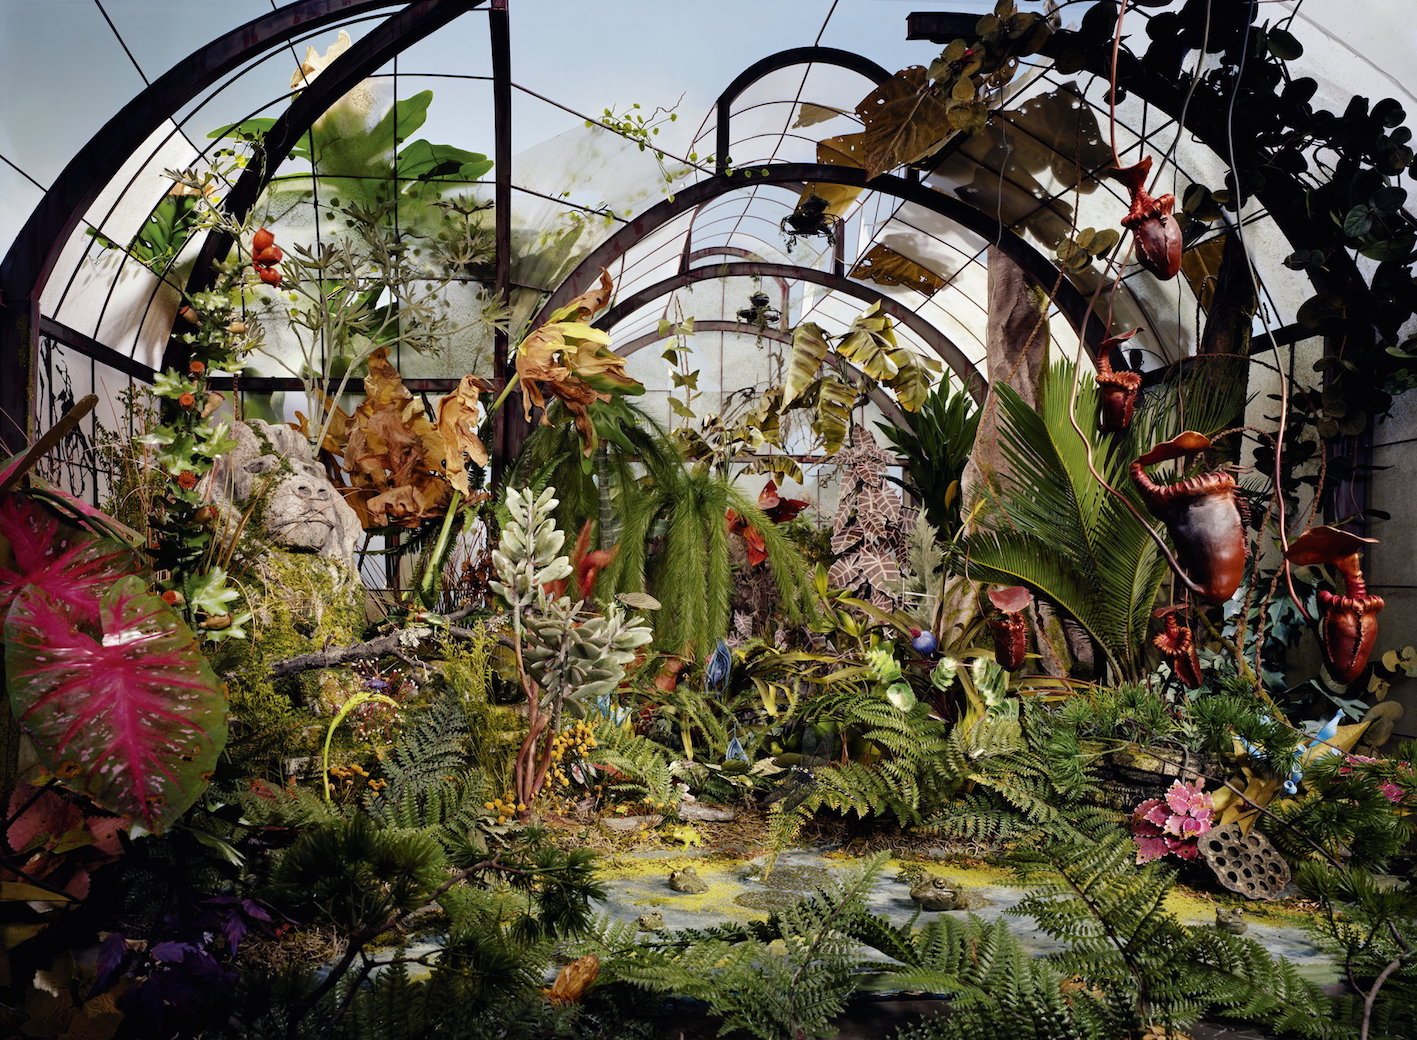 © Lori Nix, Botanic Garden, 2008.